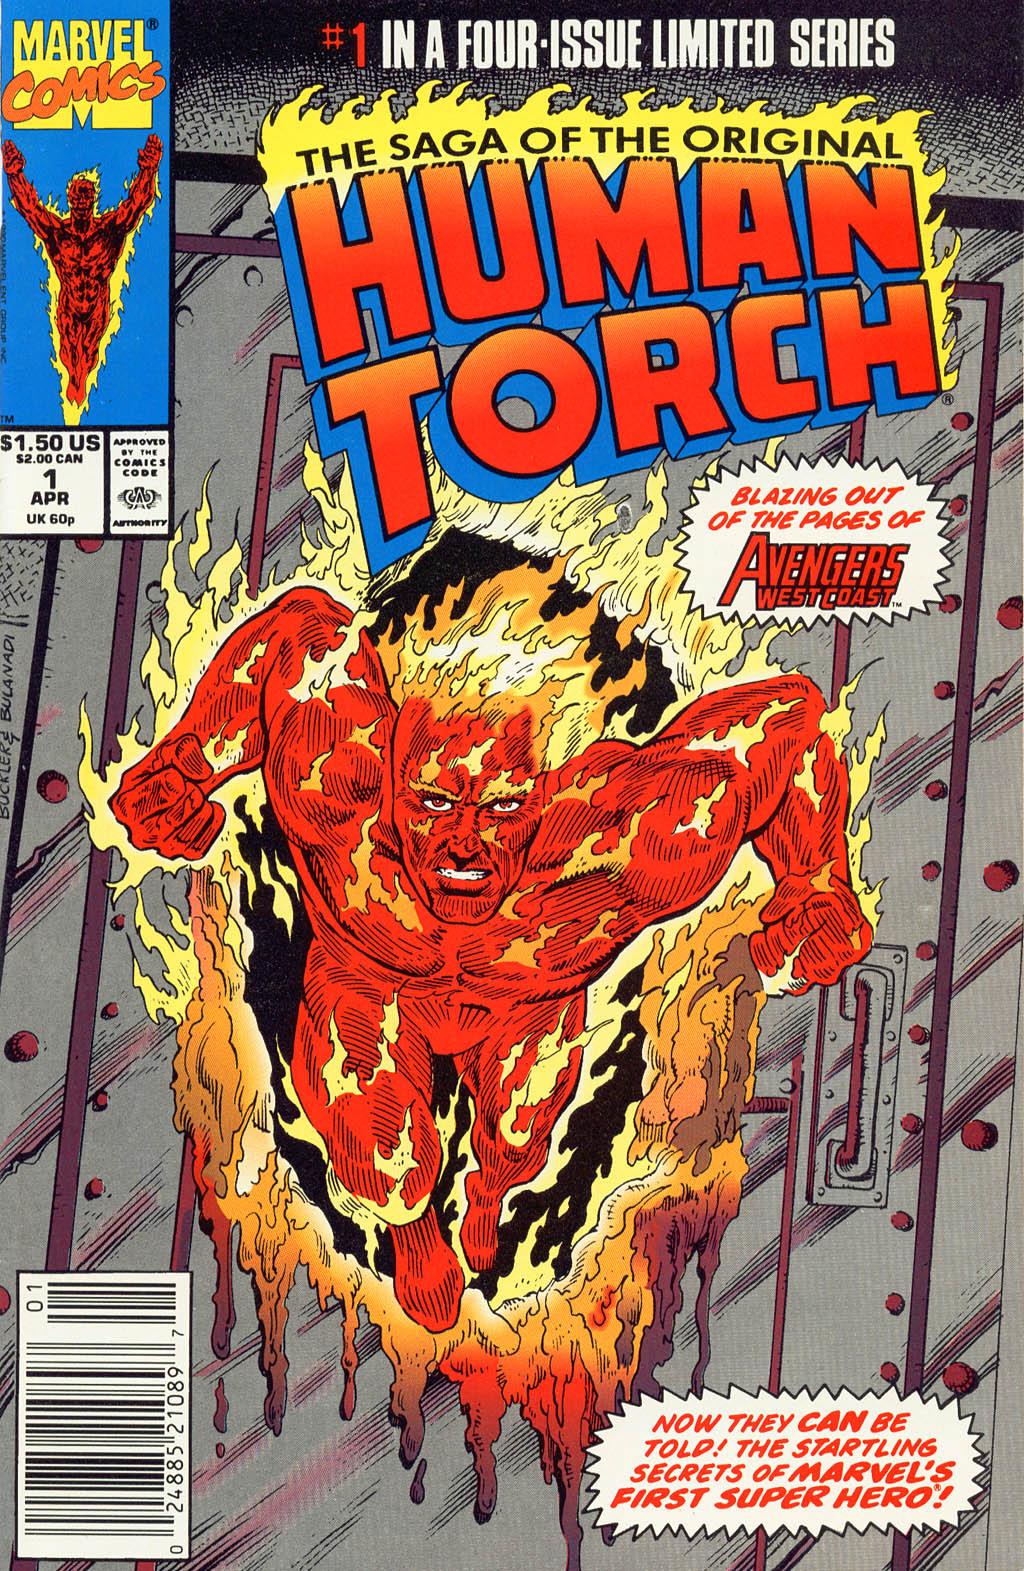 The Saga of the Original Human Torch 1 Page 1